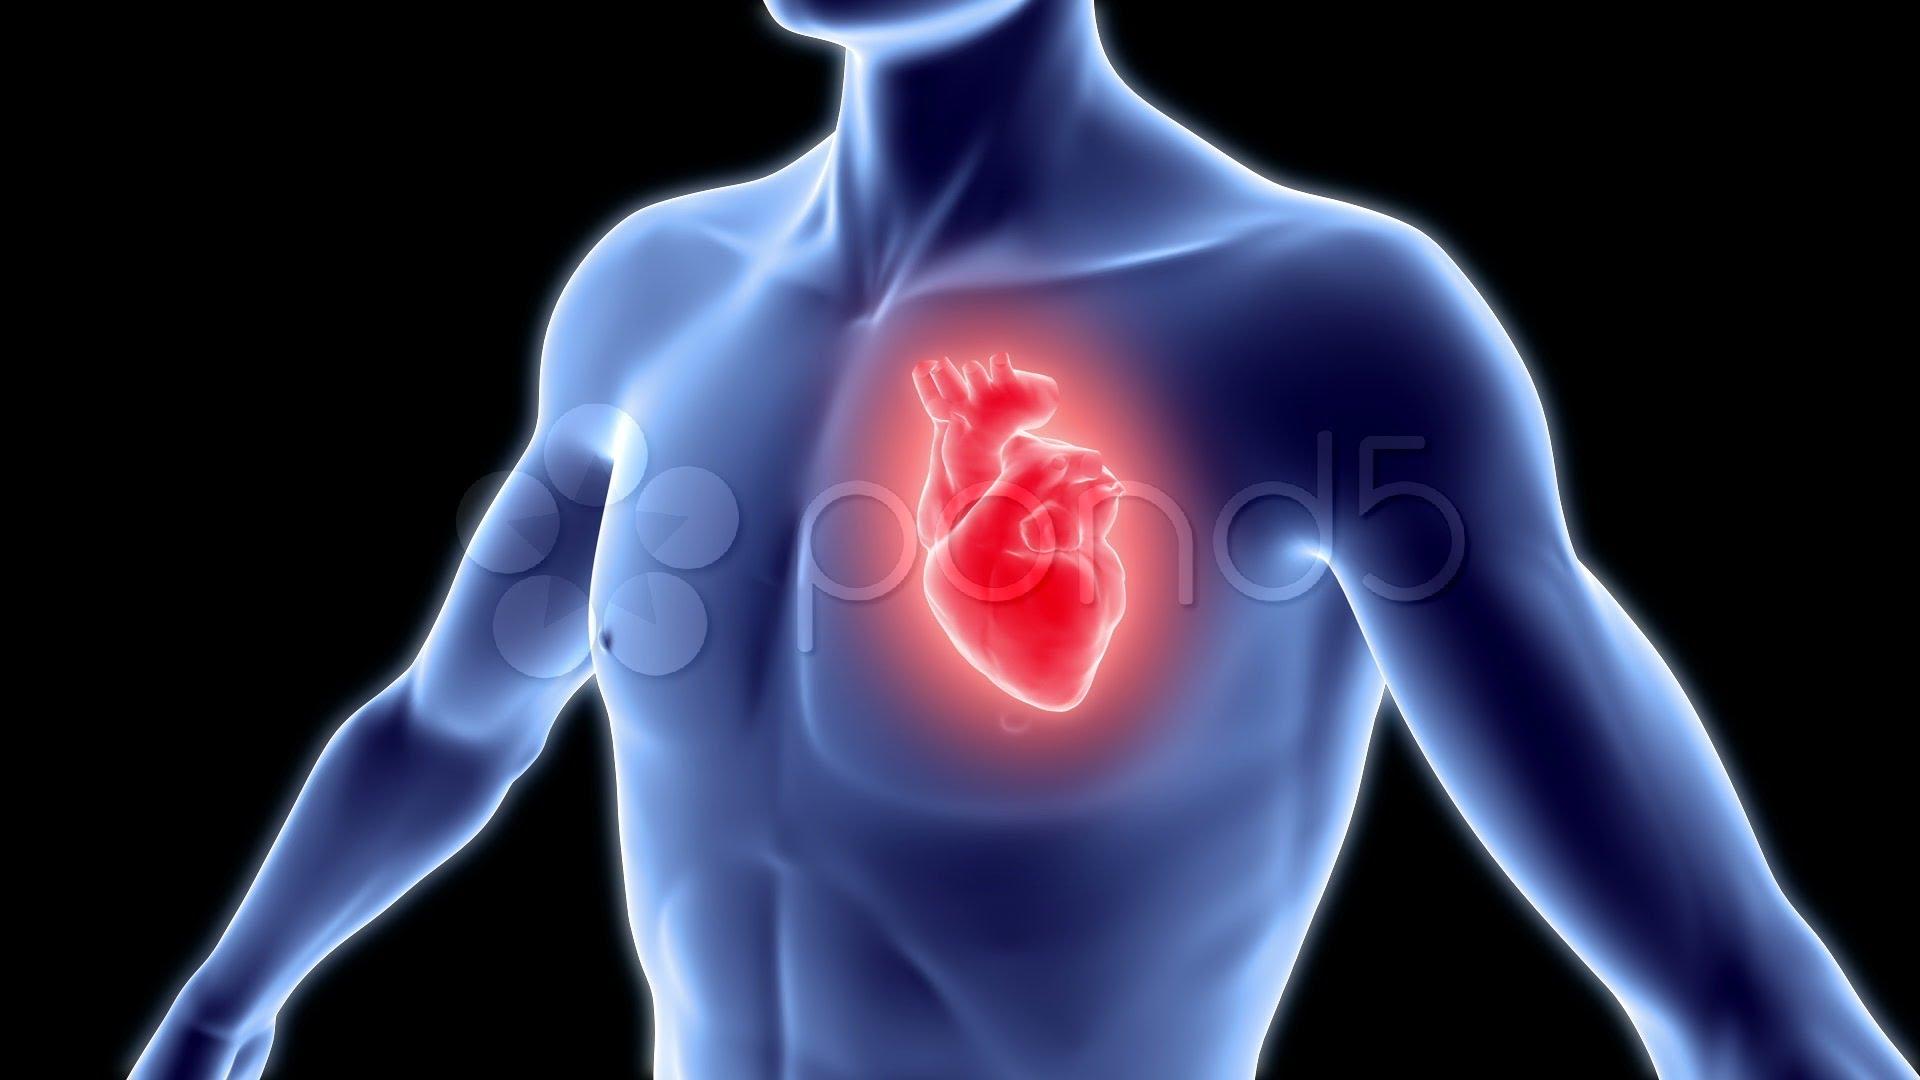 صور صور قلب الانسان , بالصور شكل قلب الانسان